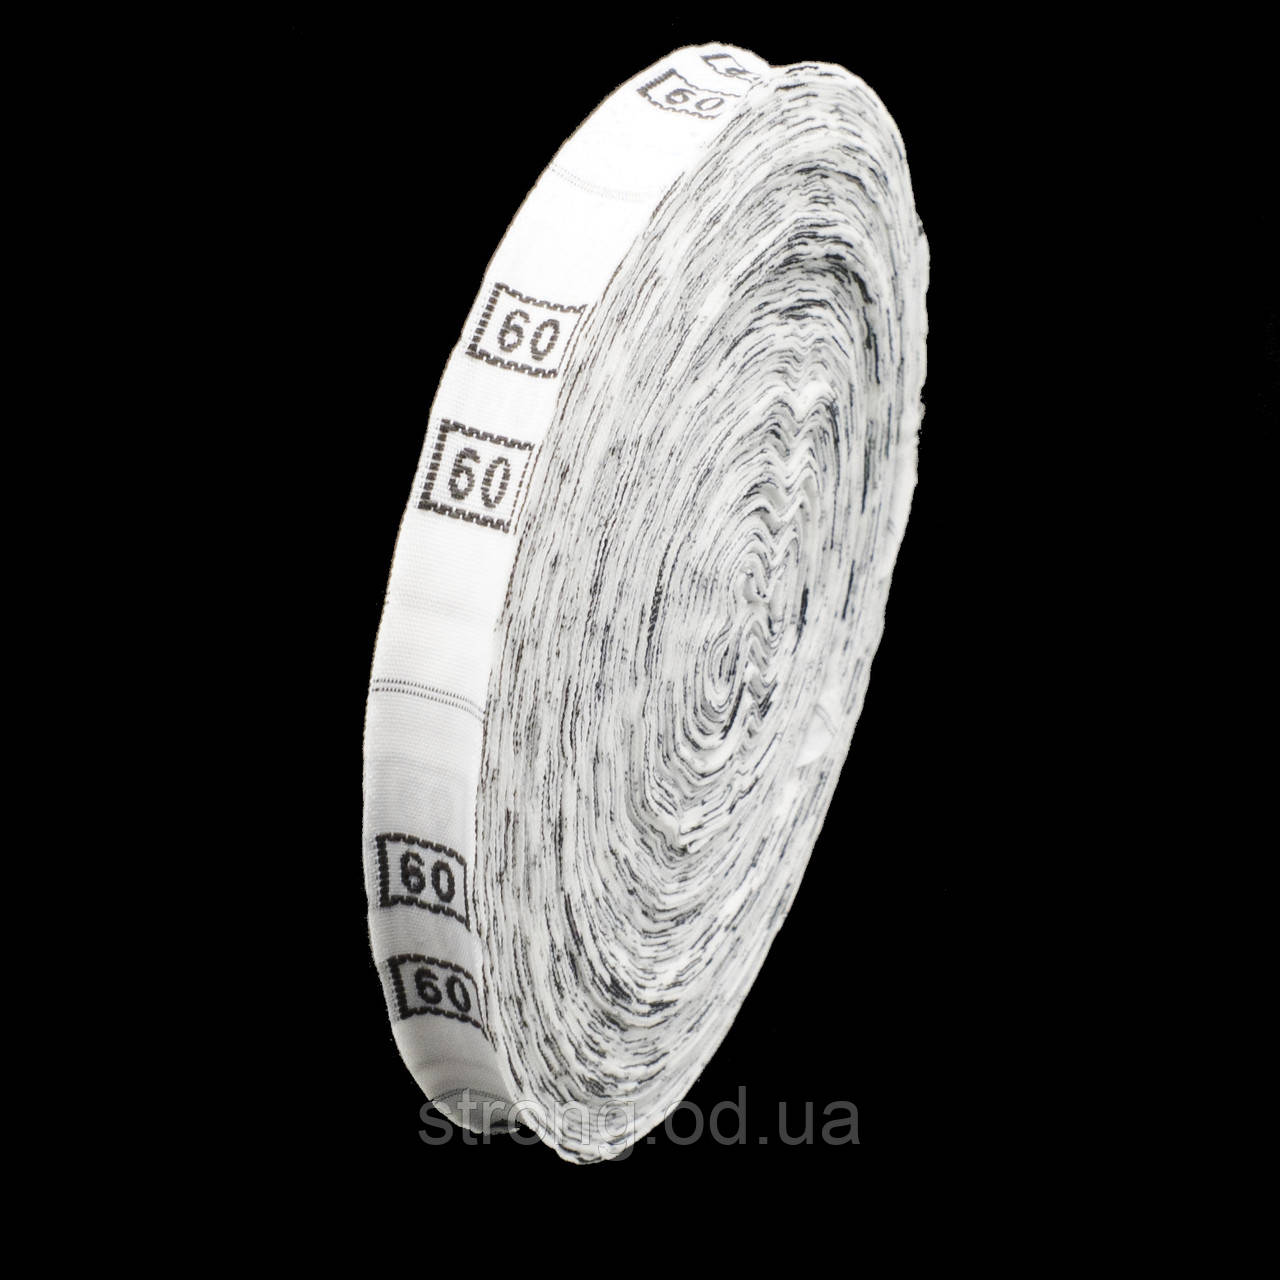 Размерник тканевый №48 960шт. Белый